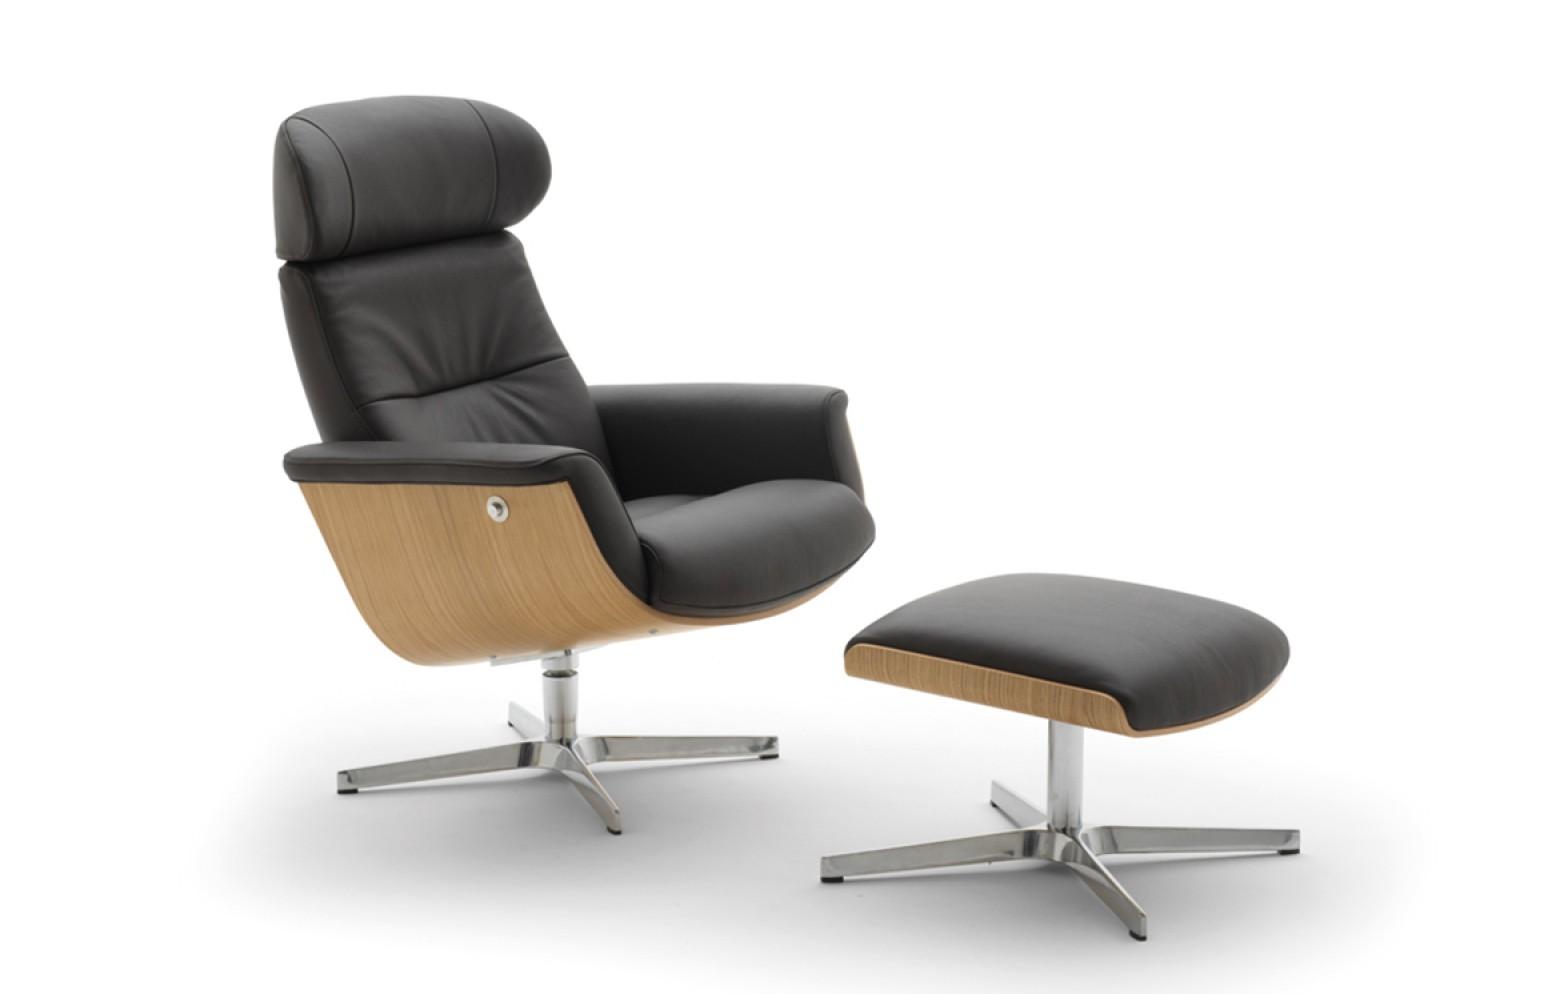 hollywood sessel liegen polsterm bel who 39 s perfect. Black Bedroom Furniture Sets. Home Design Ideas